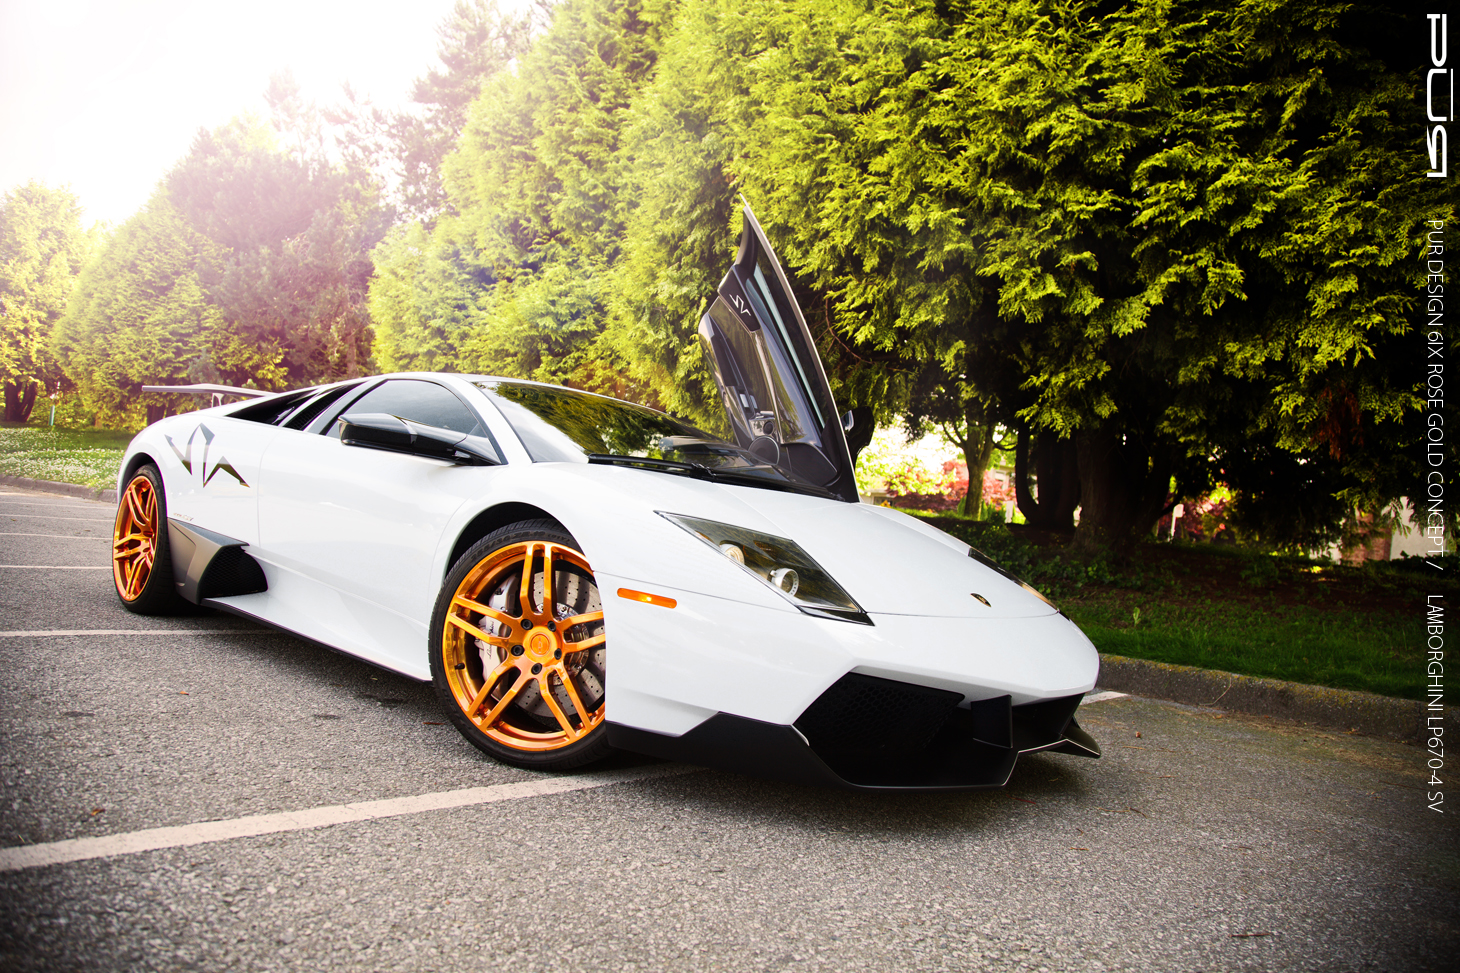 Lamborghini Murcielago 2013